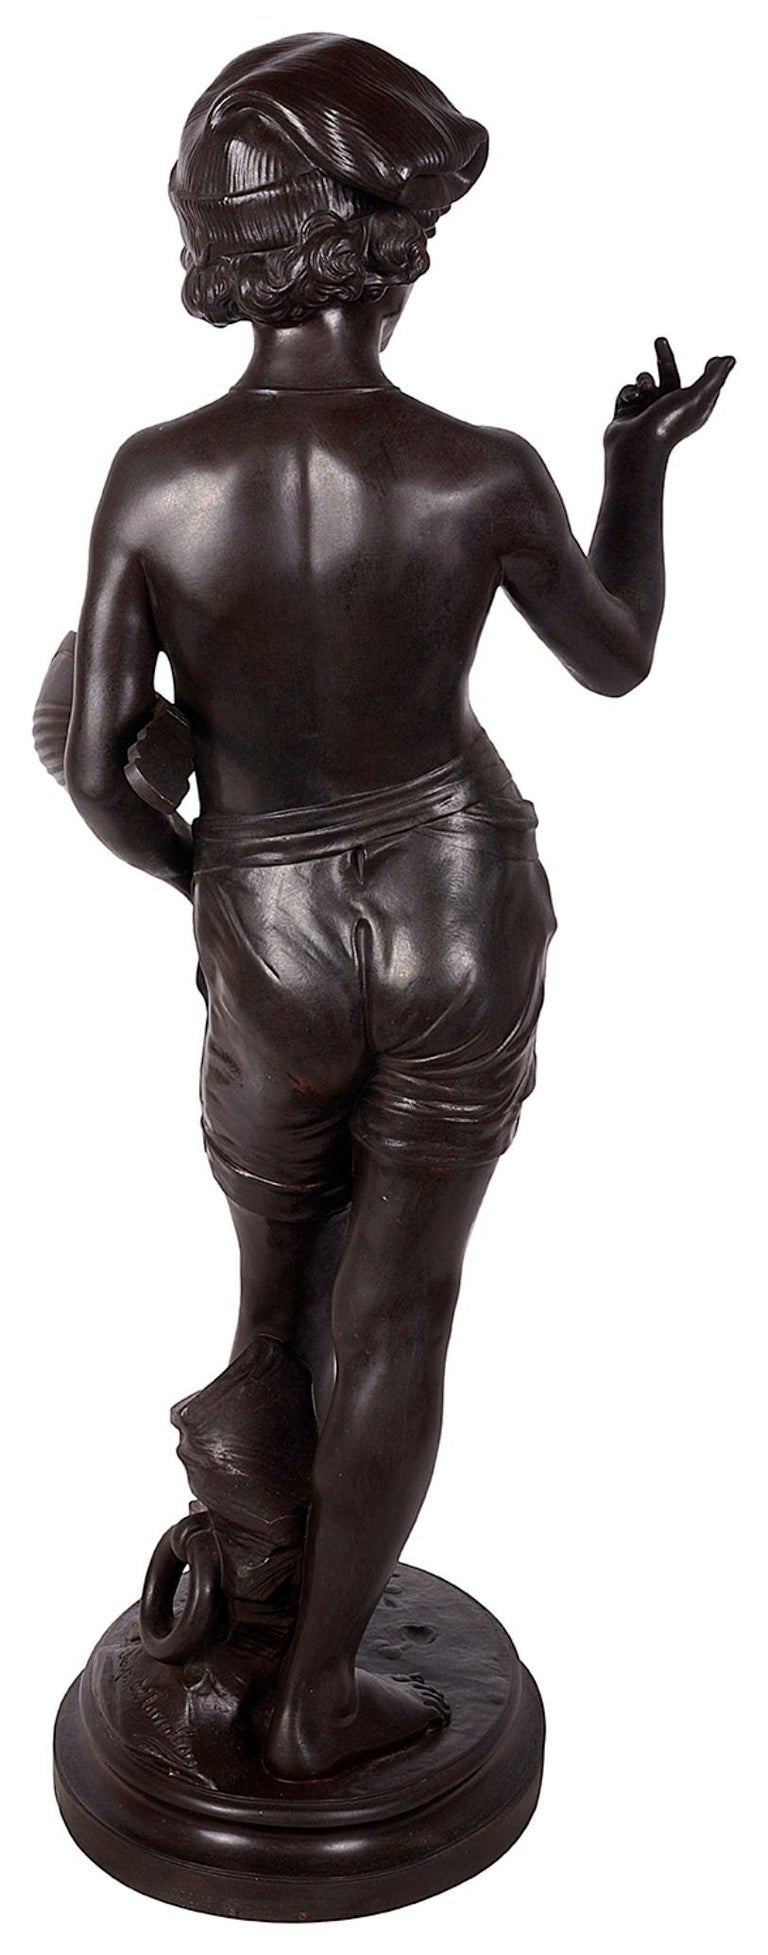 Italian Classical Bronze Statue of Boy Holding a Mandolin, circa 1880 For Sale